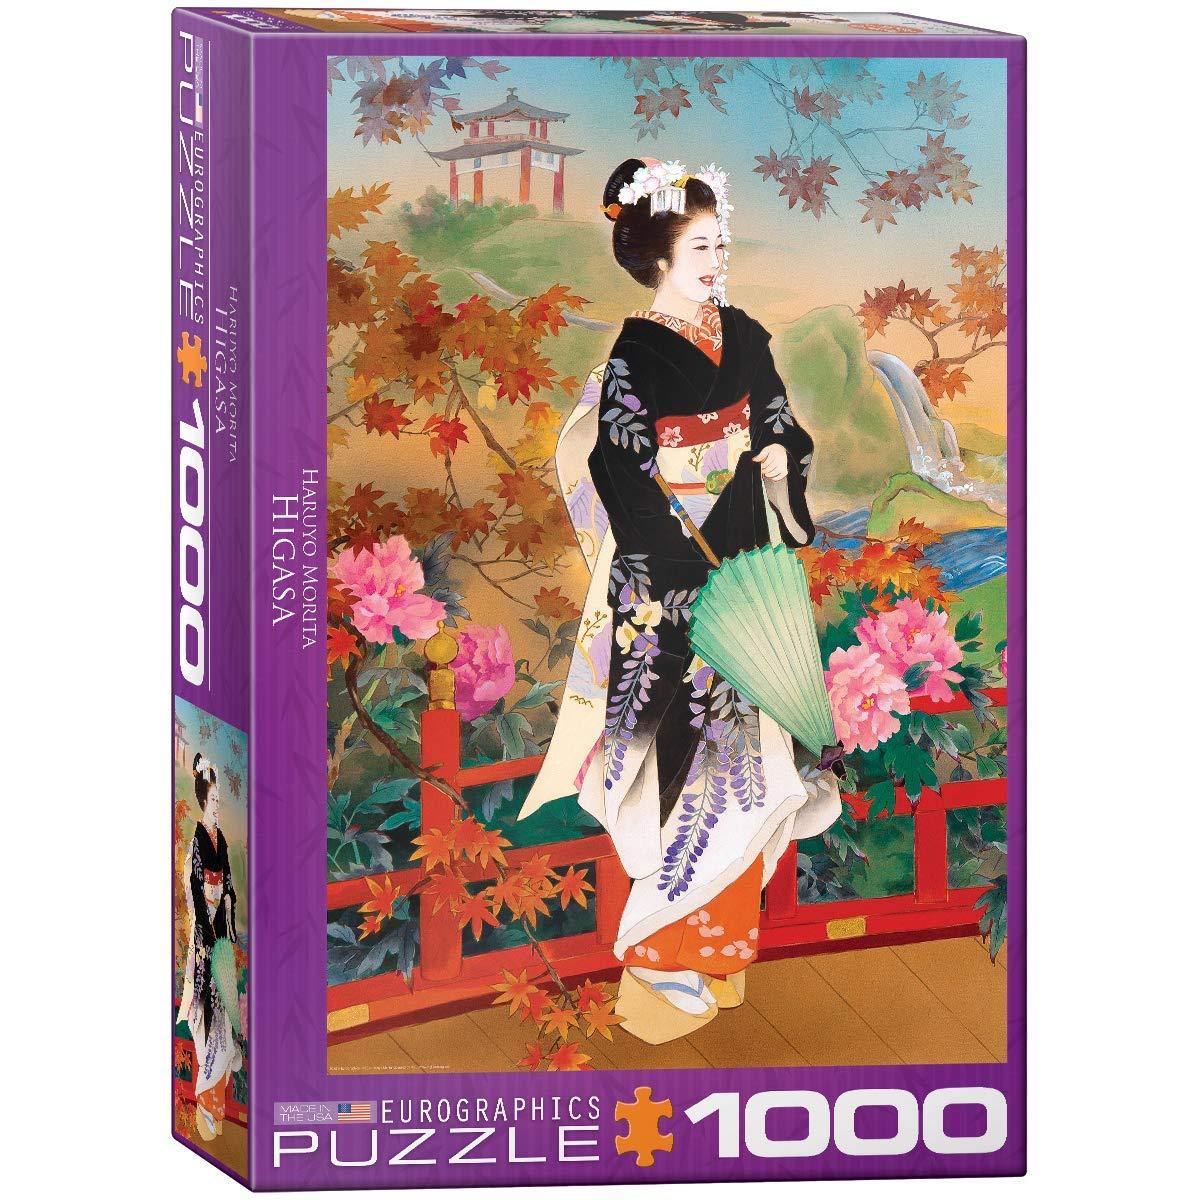 EuroGraphics Agemaki Jigsaw Puzzle 1000-Piece